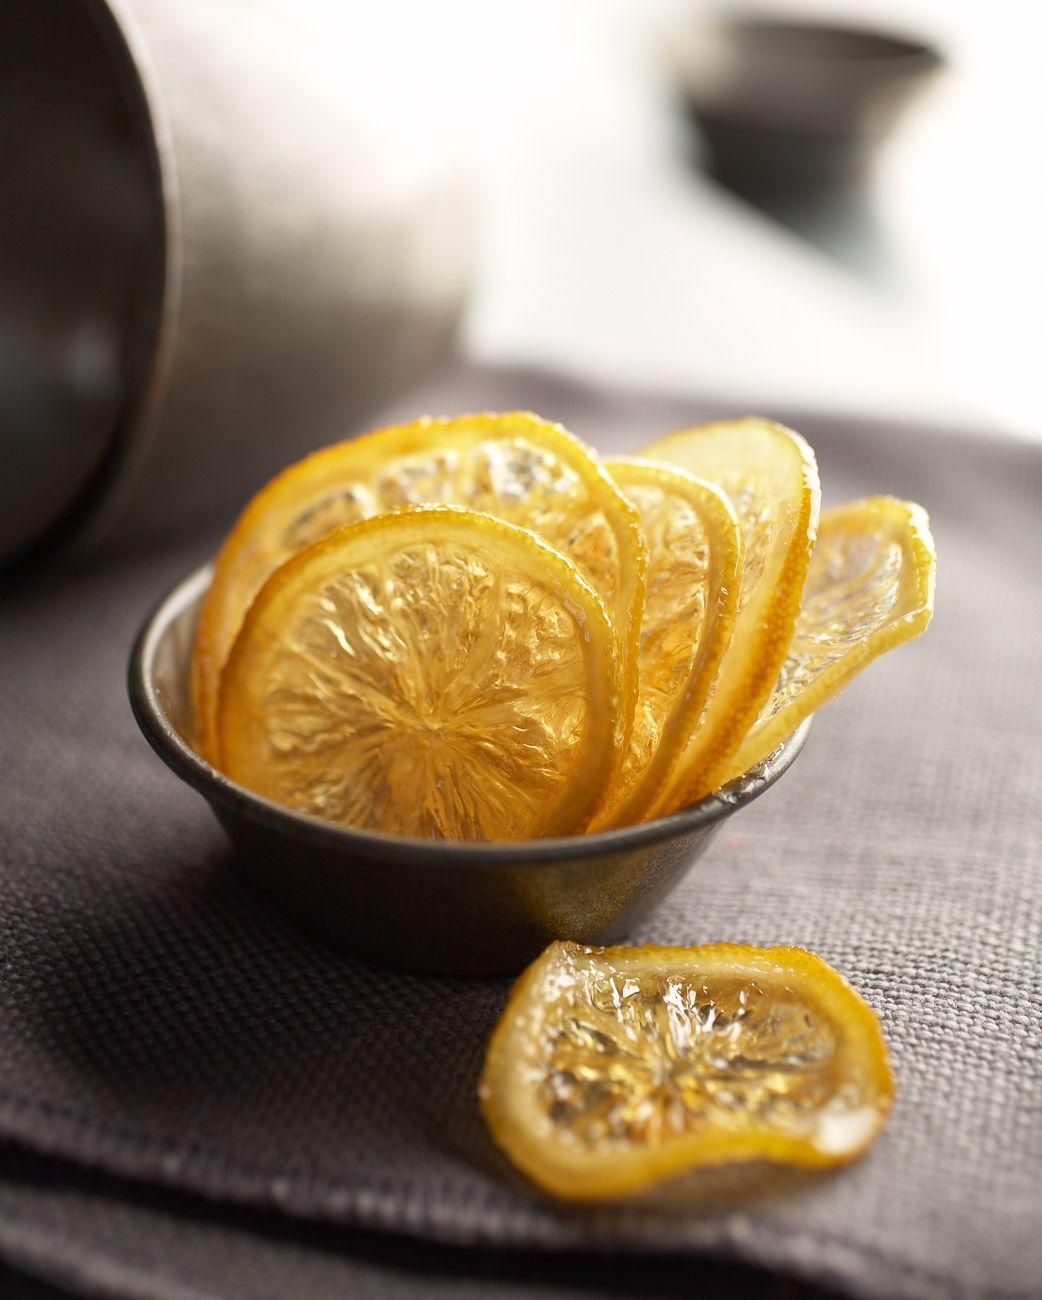 Sliced candied lemon